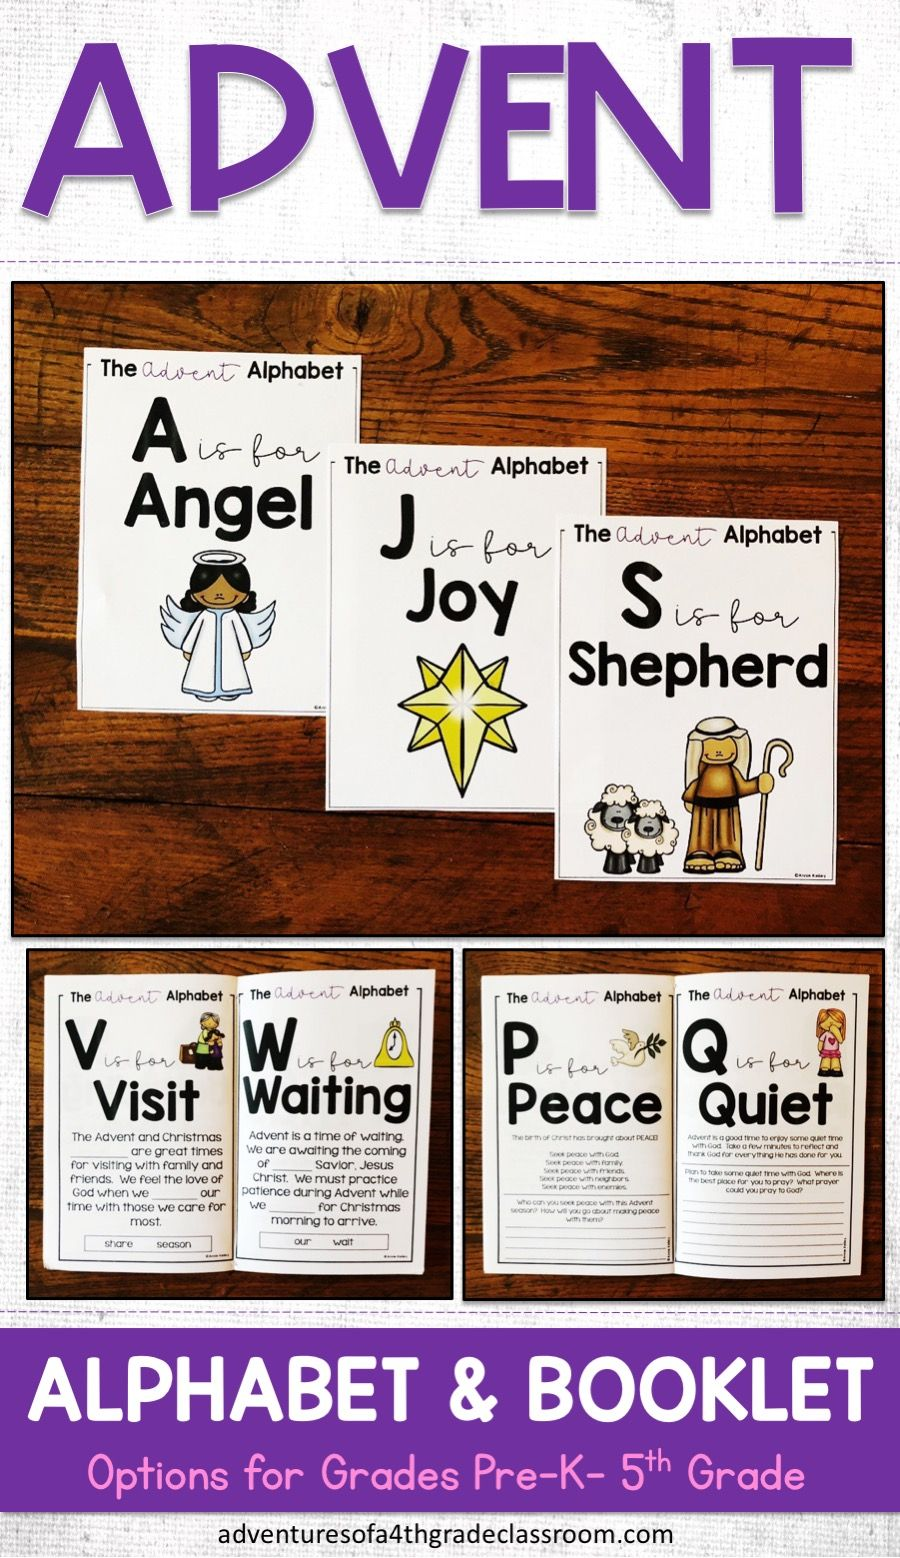 Advent Alphabet \u0026 Booklet   Elementary social studies lessons [ 1558 x 900 Pixel ]